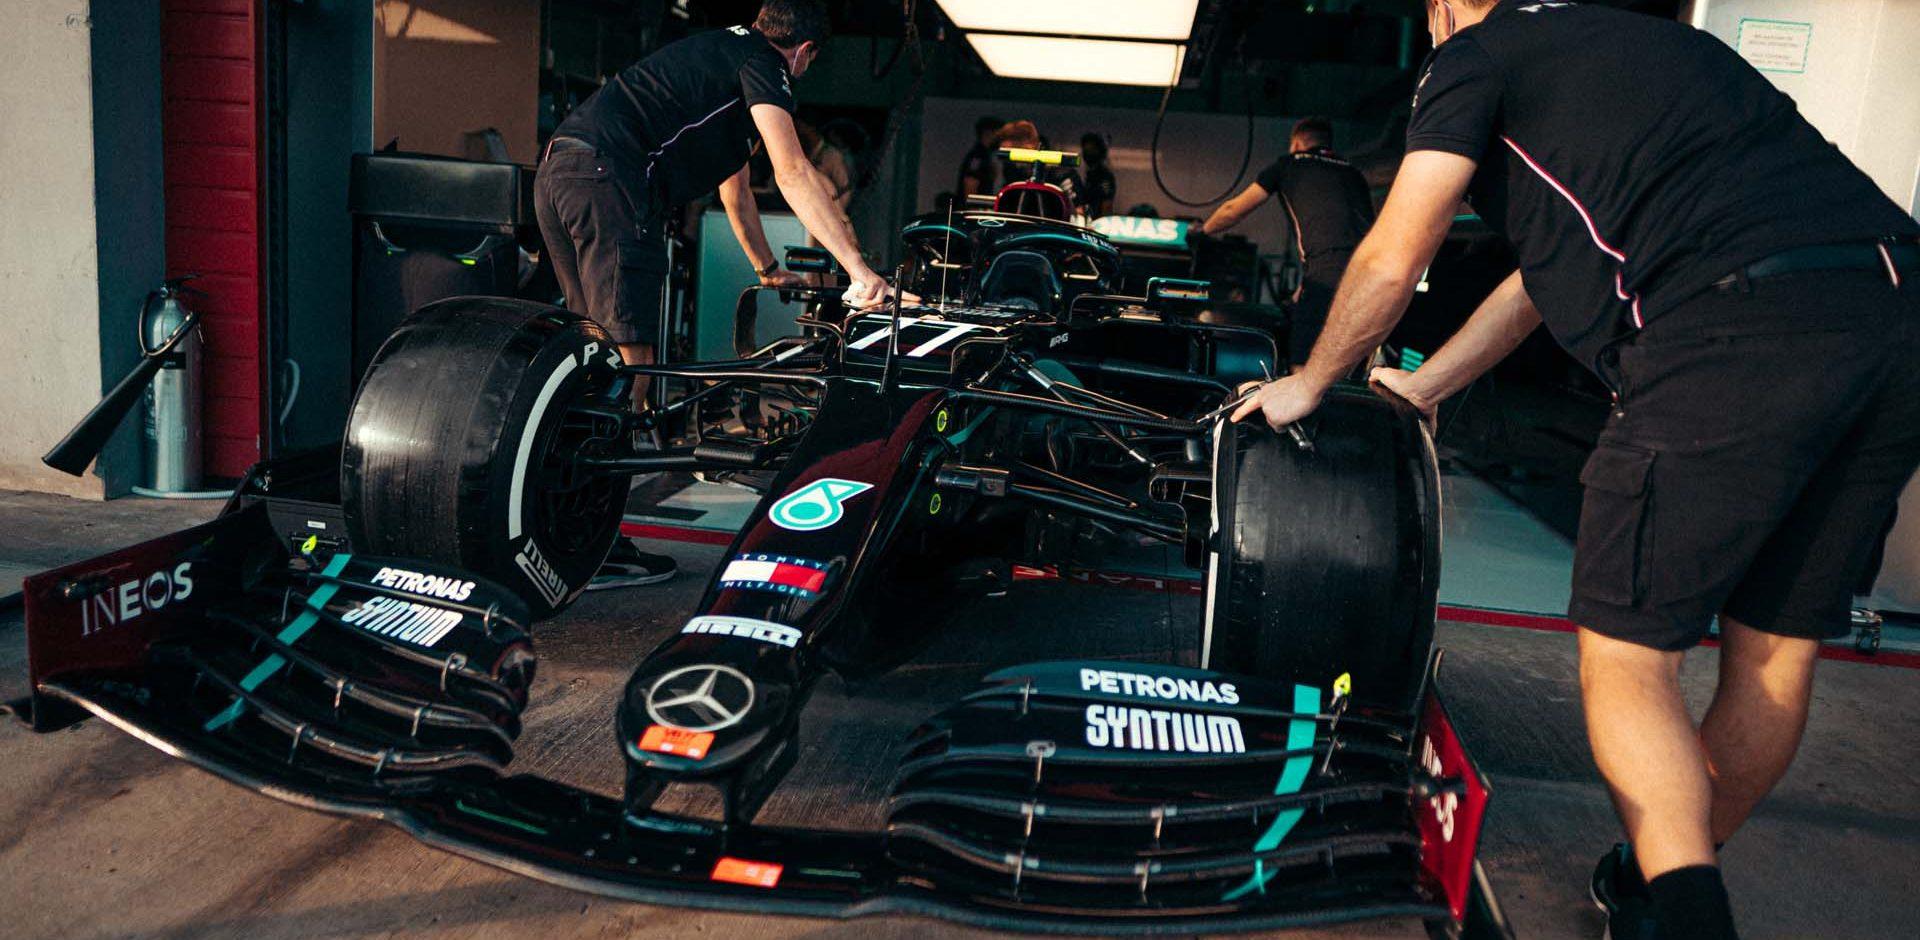 2020 Emilia Romagna Grand Prix, Friday - Sebastian Kawka Valtteri Bottas Mercedes